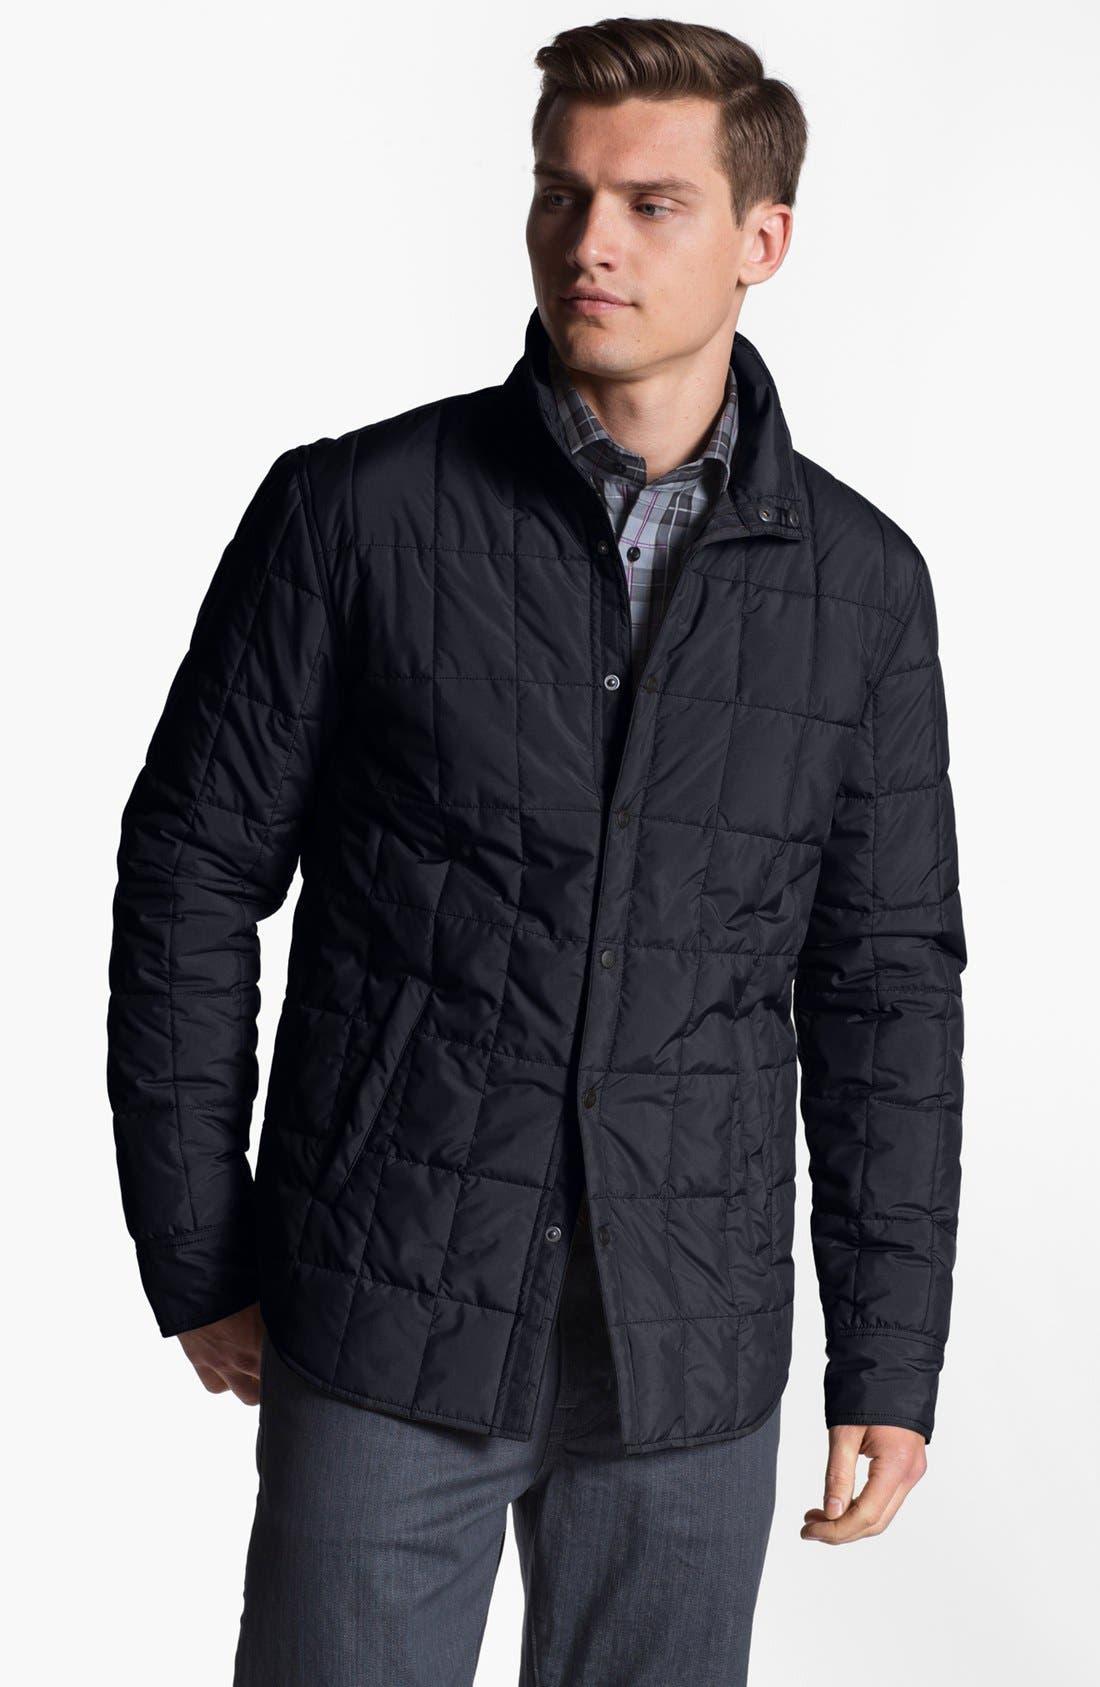 Main Image - Victorinox Swiss Army® 'Utility' Shirt Jacket